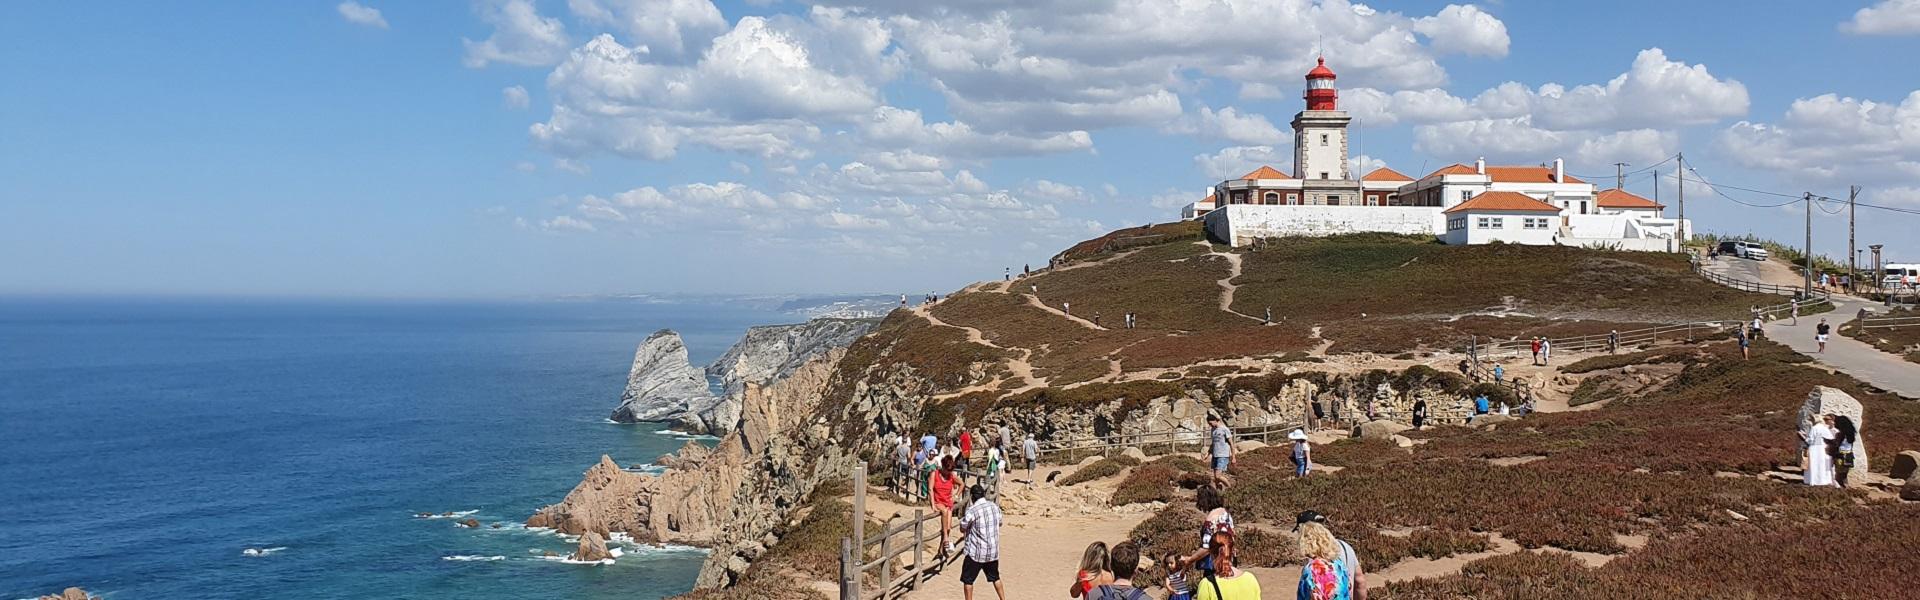 Португалия: путешествие на край Европы